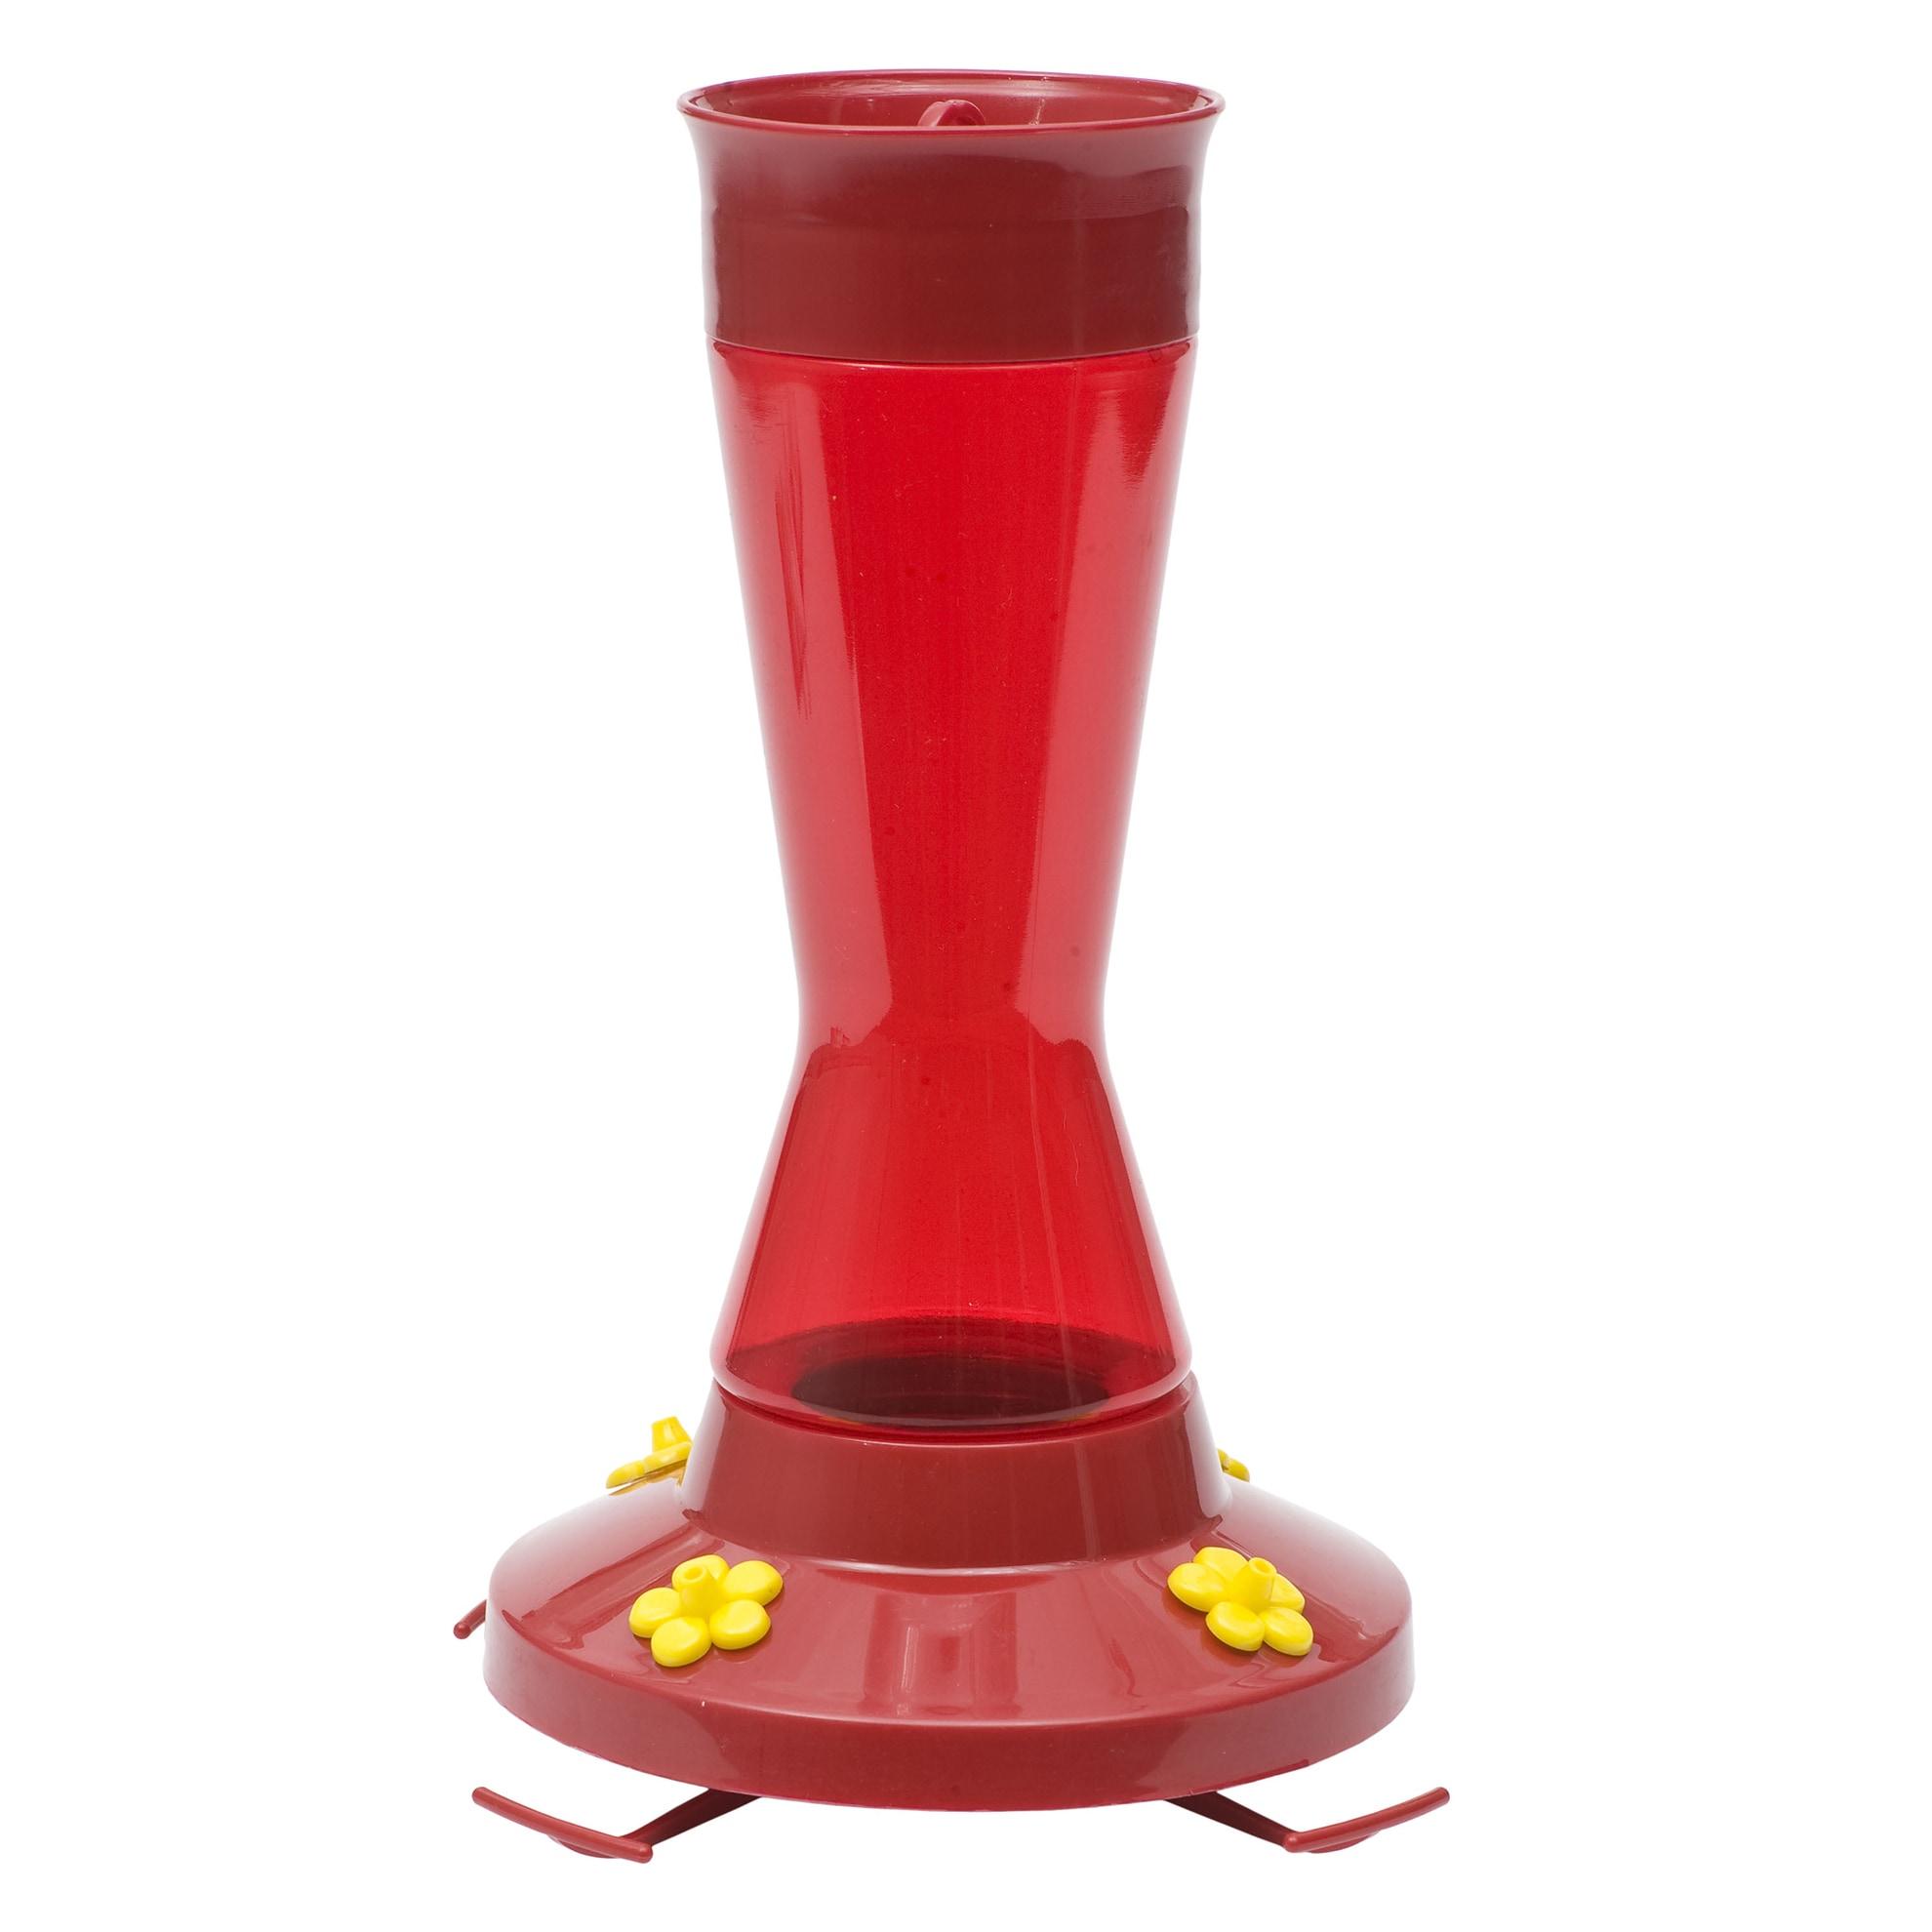 Perky-Pet 16 Oz Red Plastic Pinch Waist Hummingbird Feede...